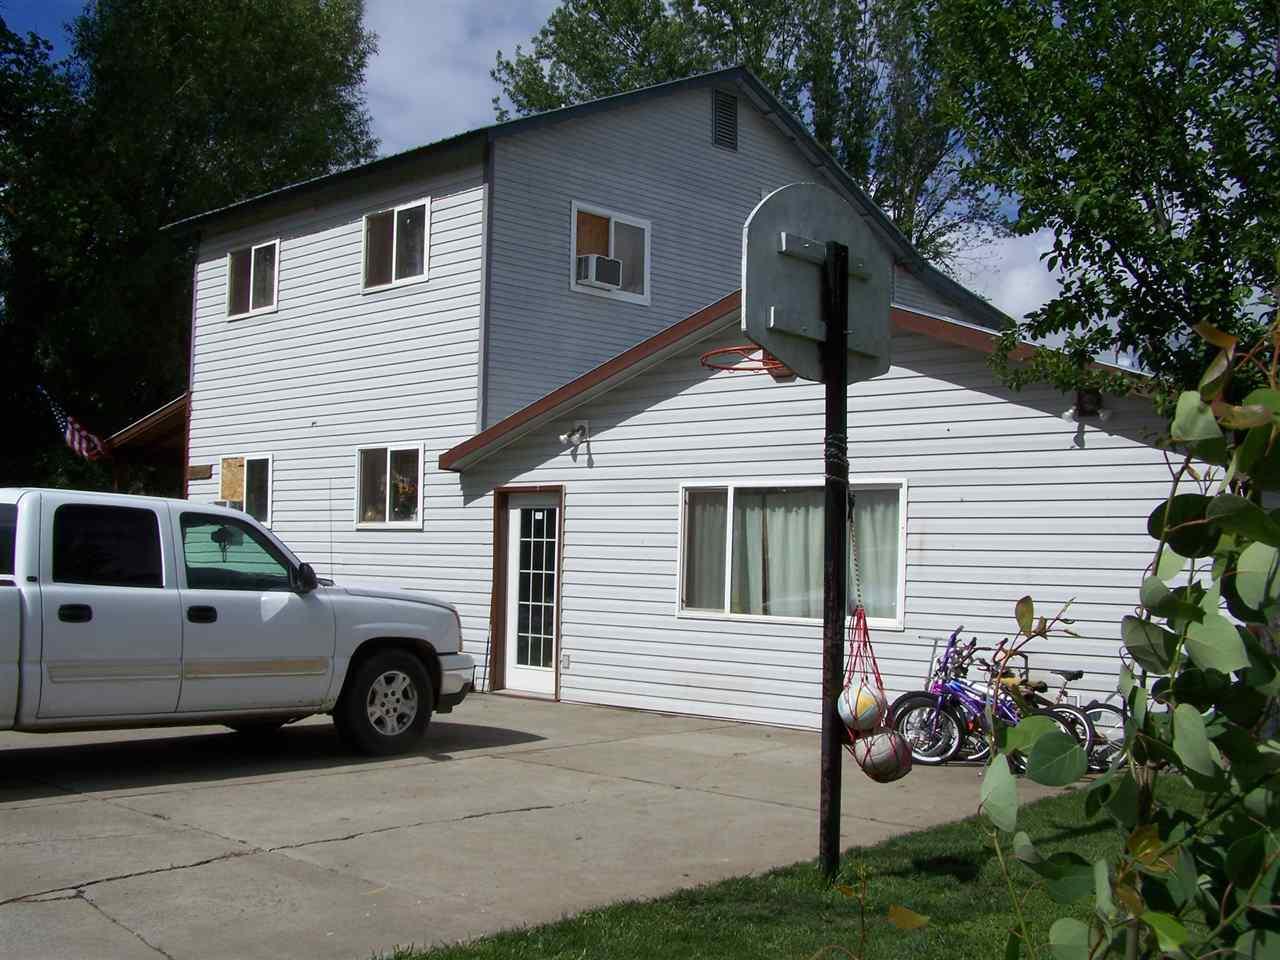 45 N Weiser St, Midvale, ID 83645